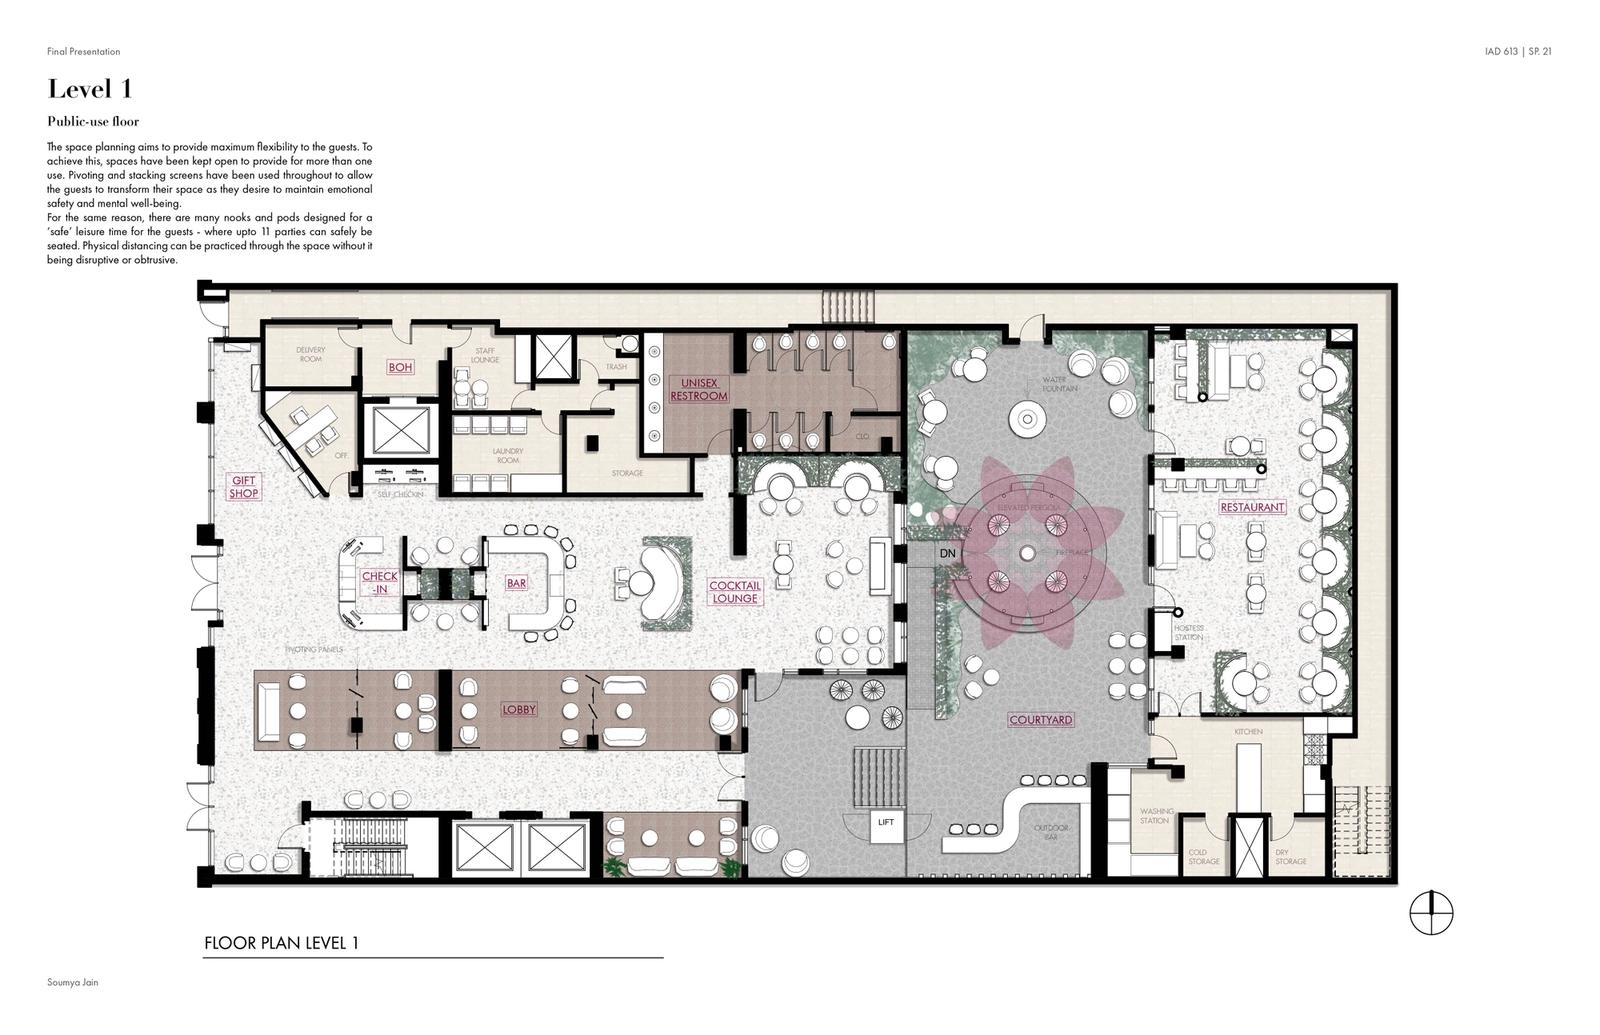 Hotel Florescence - Level 1